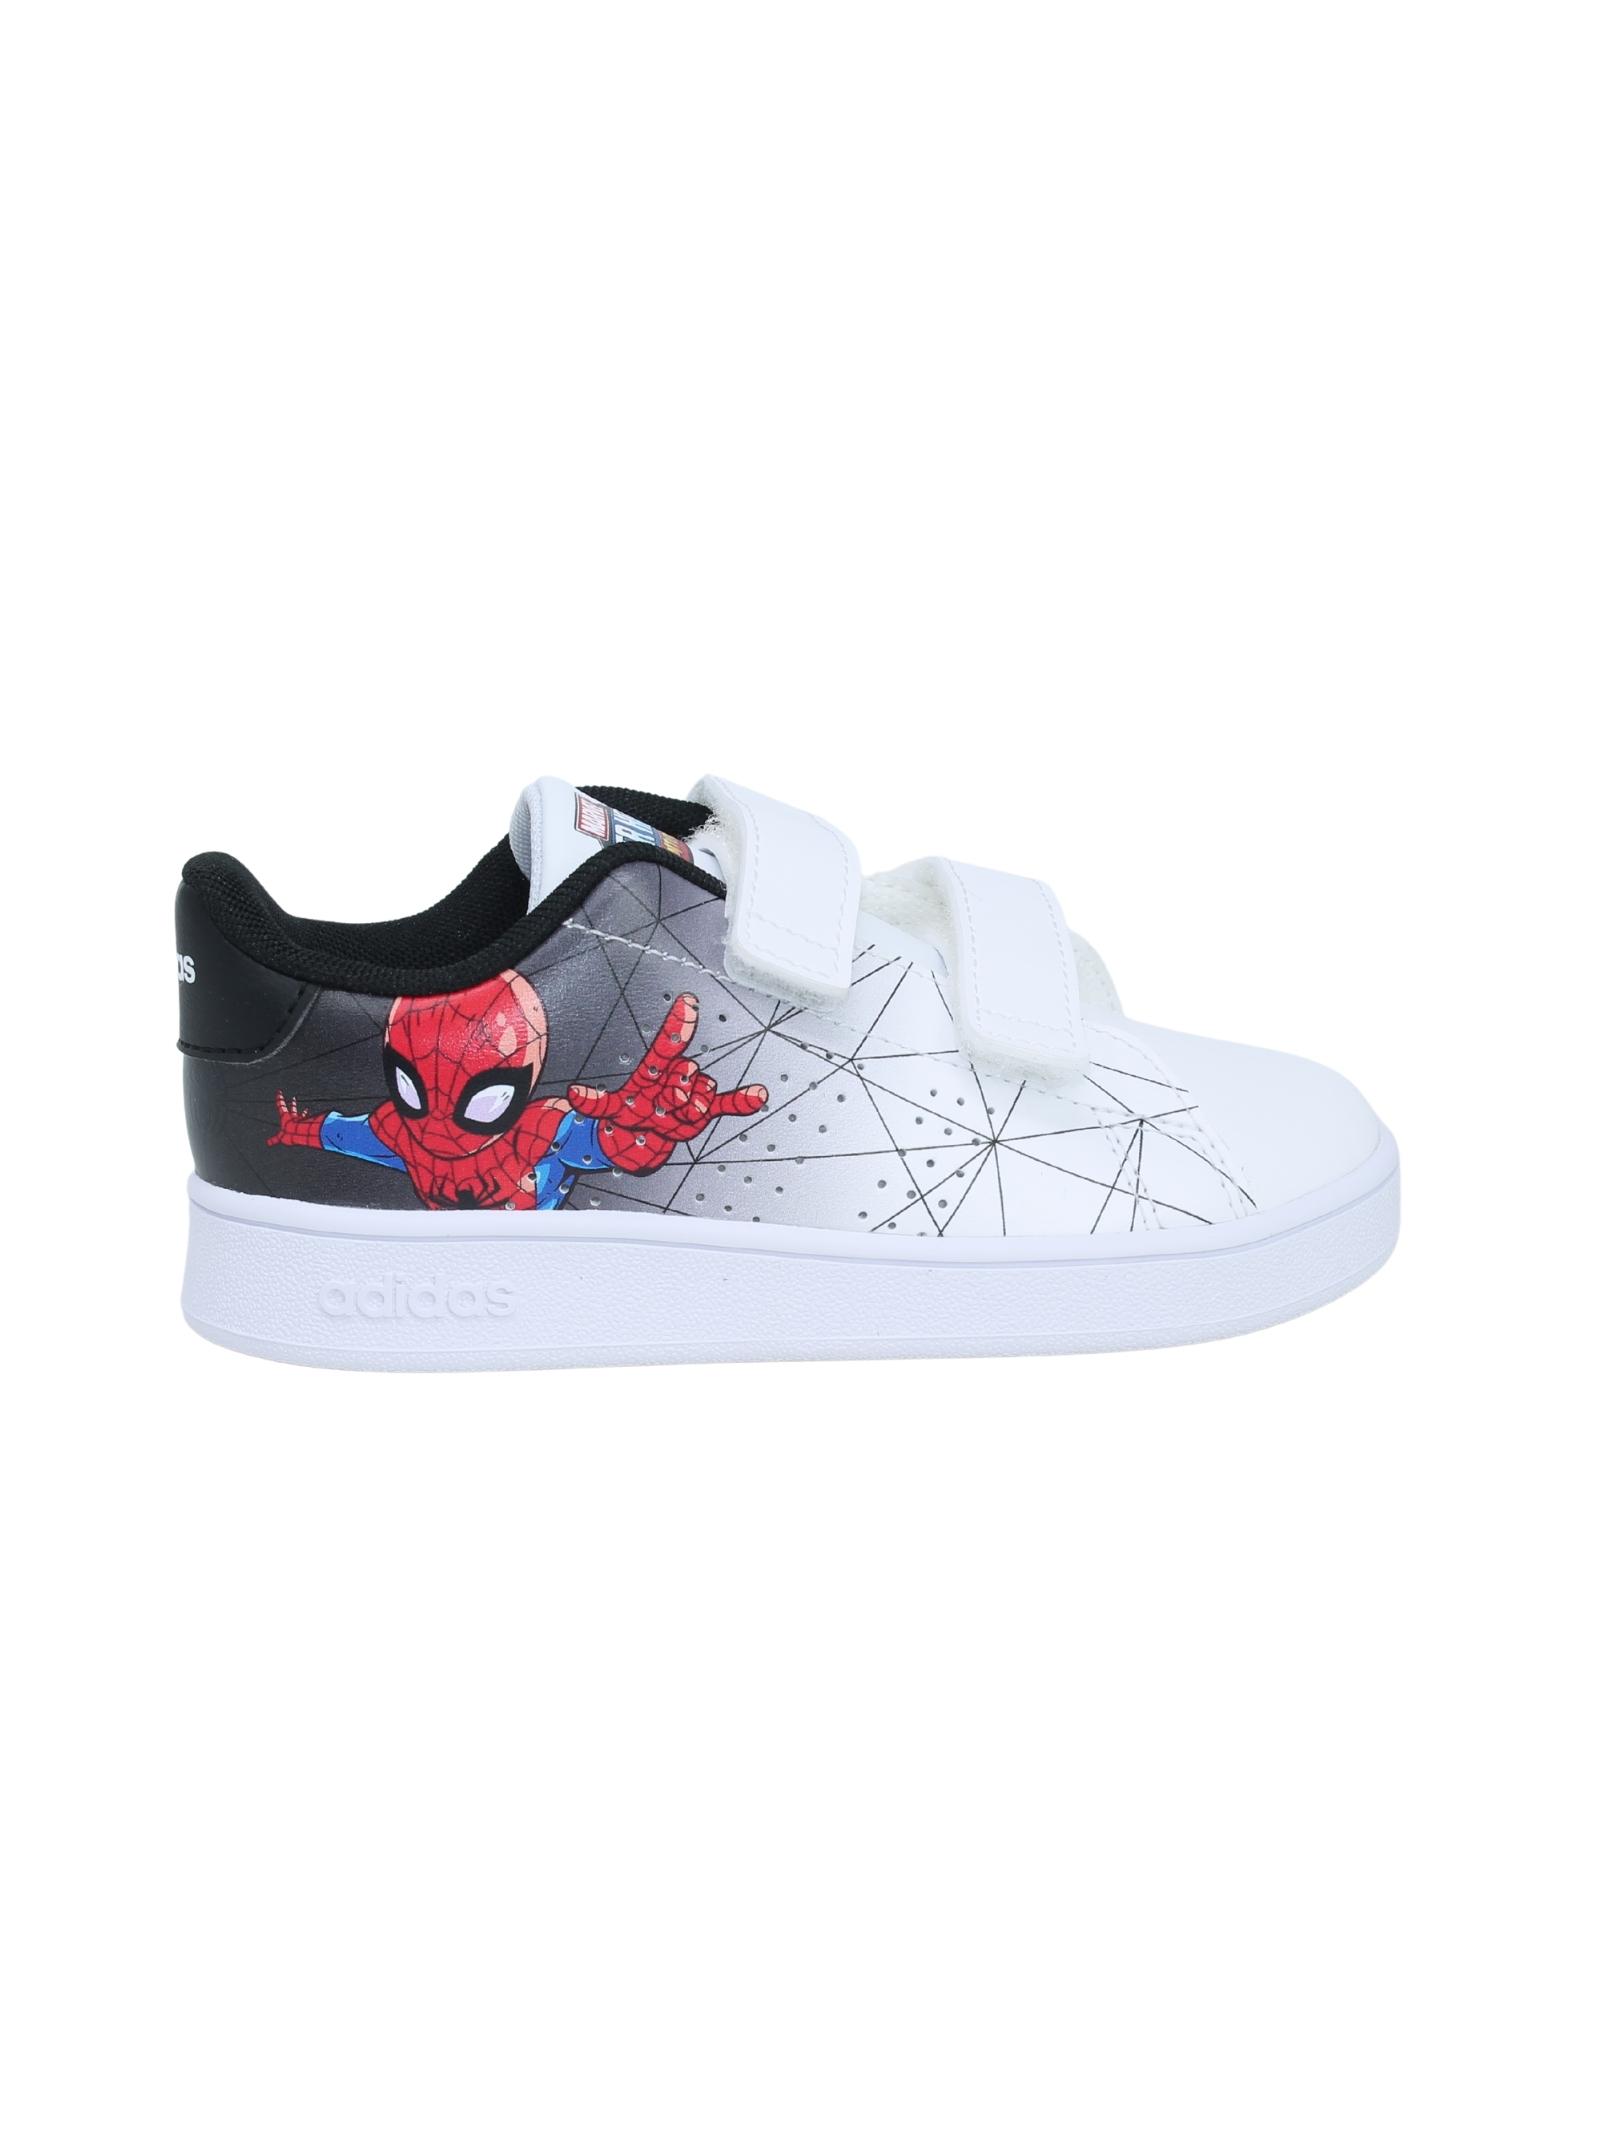 Sneakers Bambino Spiderman ADIDAS JUNIOR | Sneakers | FY9253BIANCO